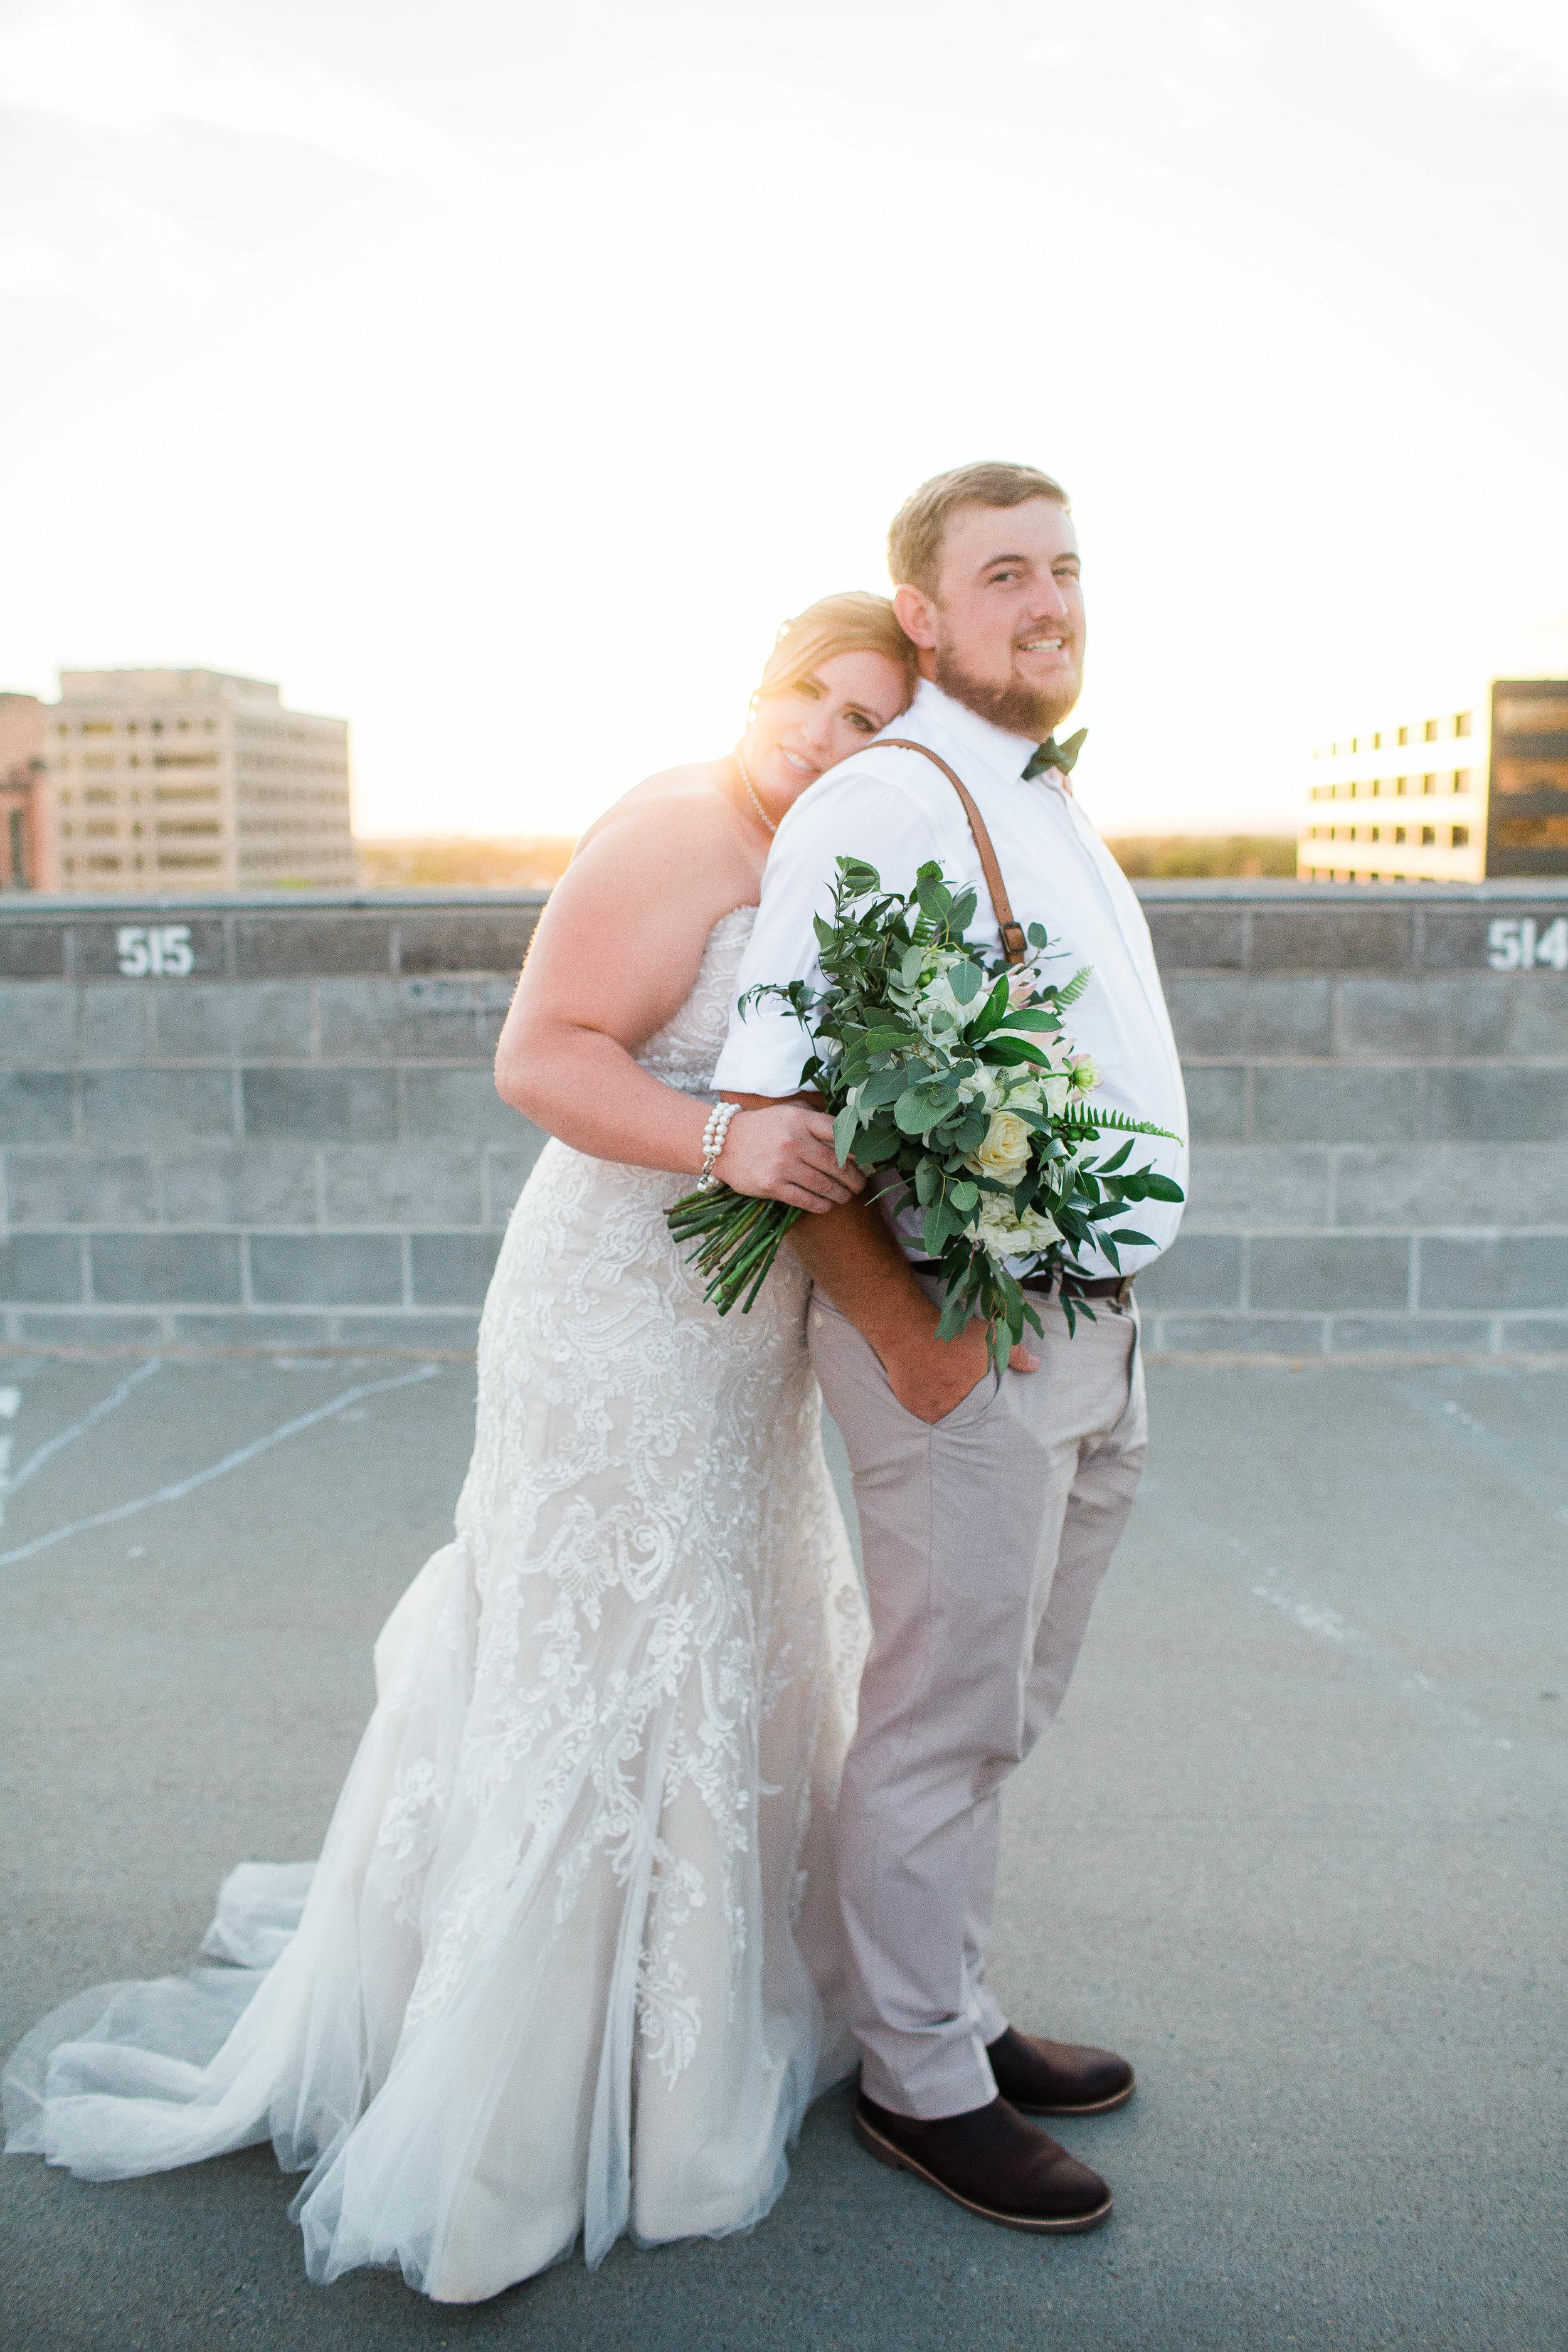 E-Lydia-Rohan-Downtown-Boise-Wedding-3.jpg